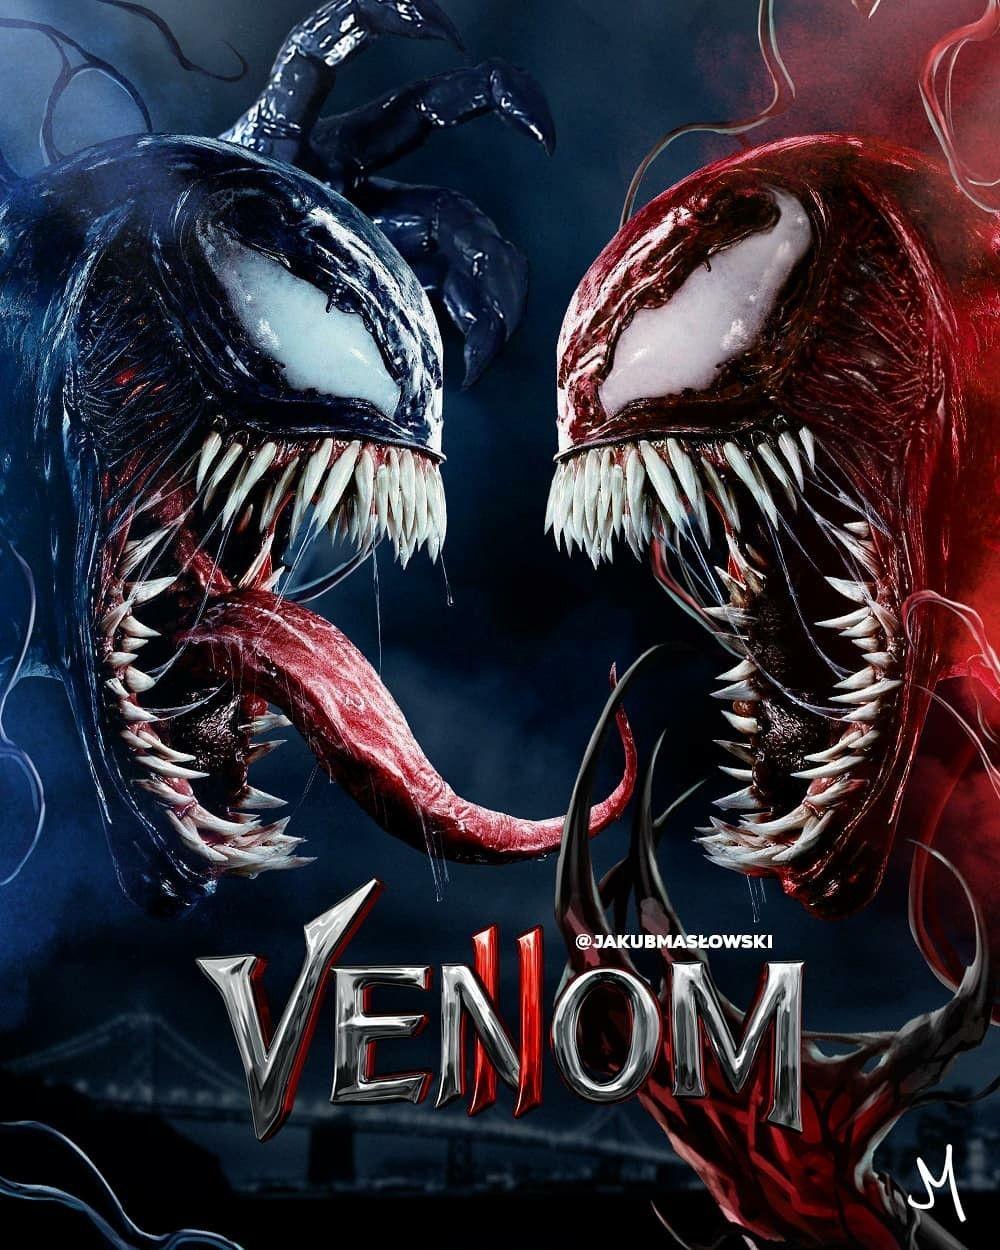 Venom 2 Trailer: Watch Woody Harrelson's Bloody Fight Against Tom Hardy